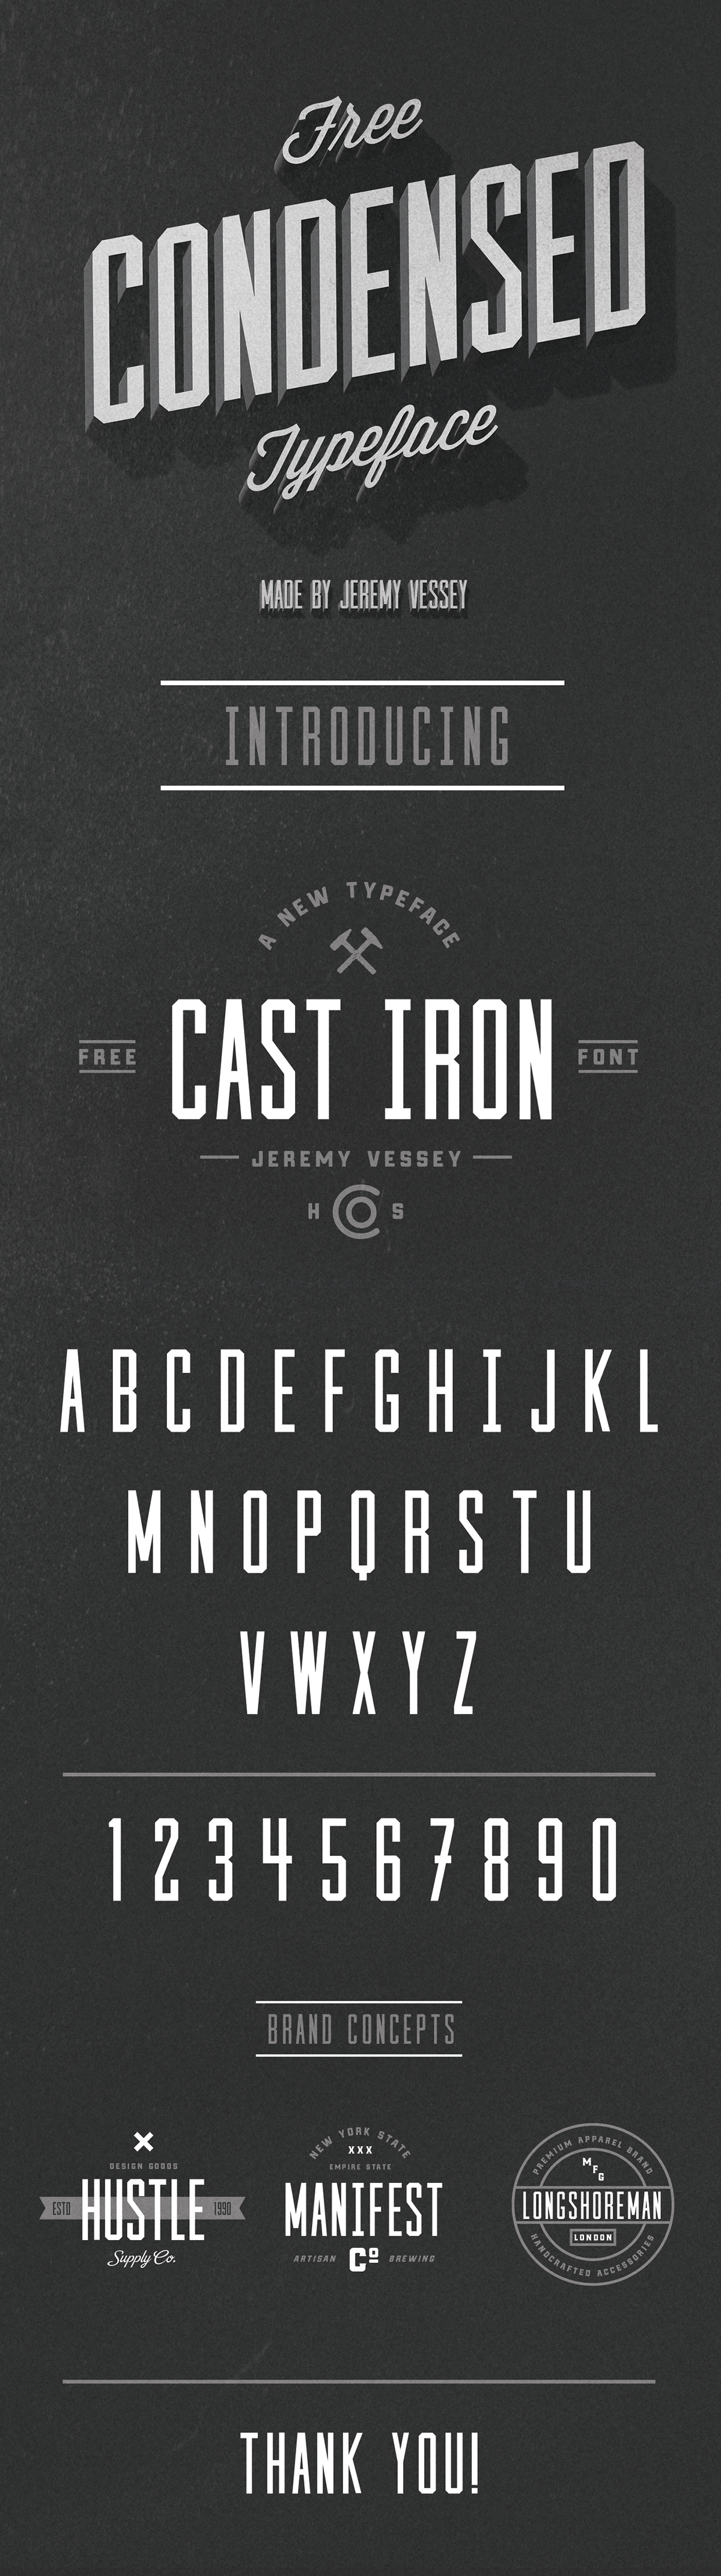 Free font free typeface free Cast Iron condensed font vintage logo logo lettering Logo Design type design retro logo retro font free type